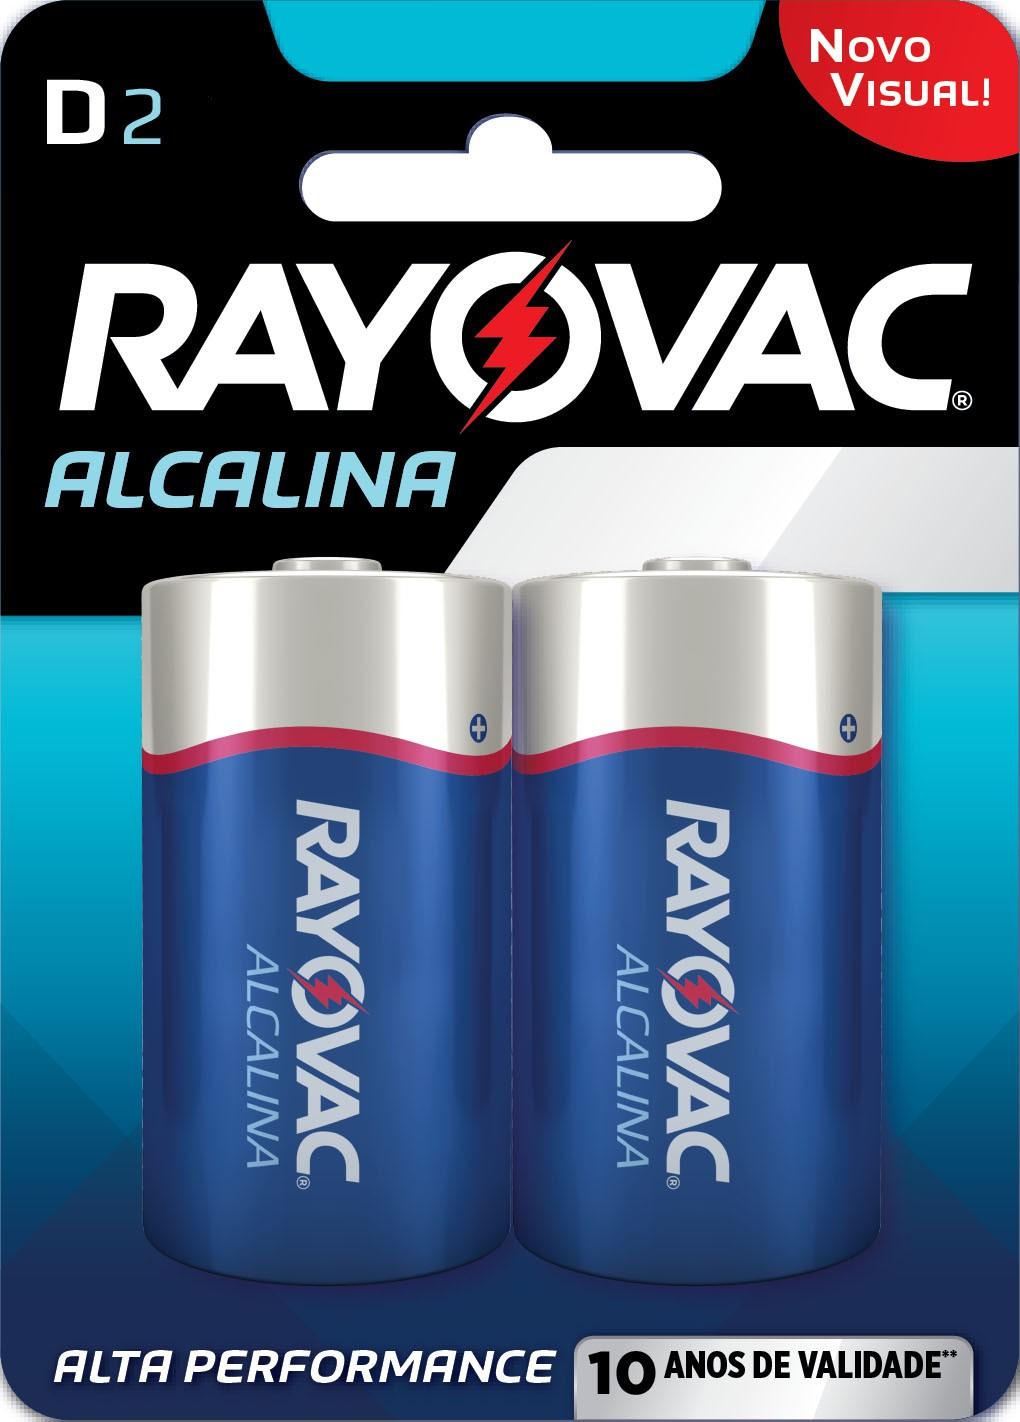 08 Pilhas D Grande LR20 Alcalina RAYOVAC 04 Cart c/ 2 unid